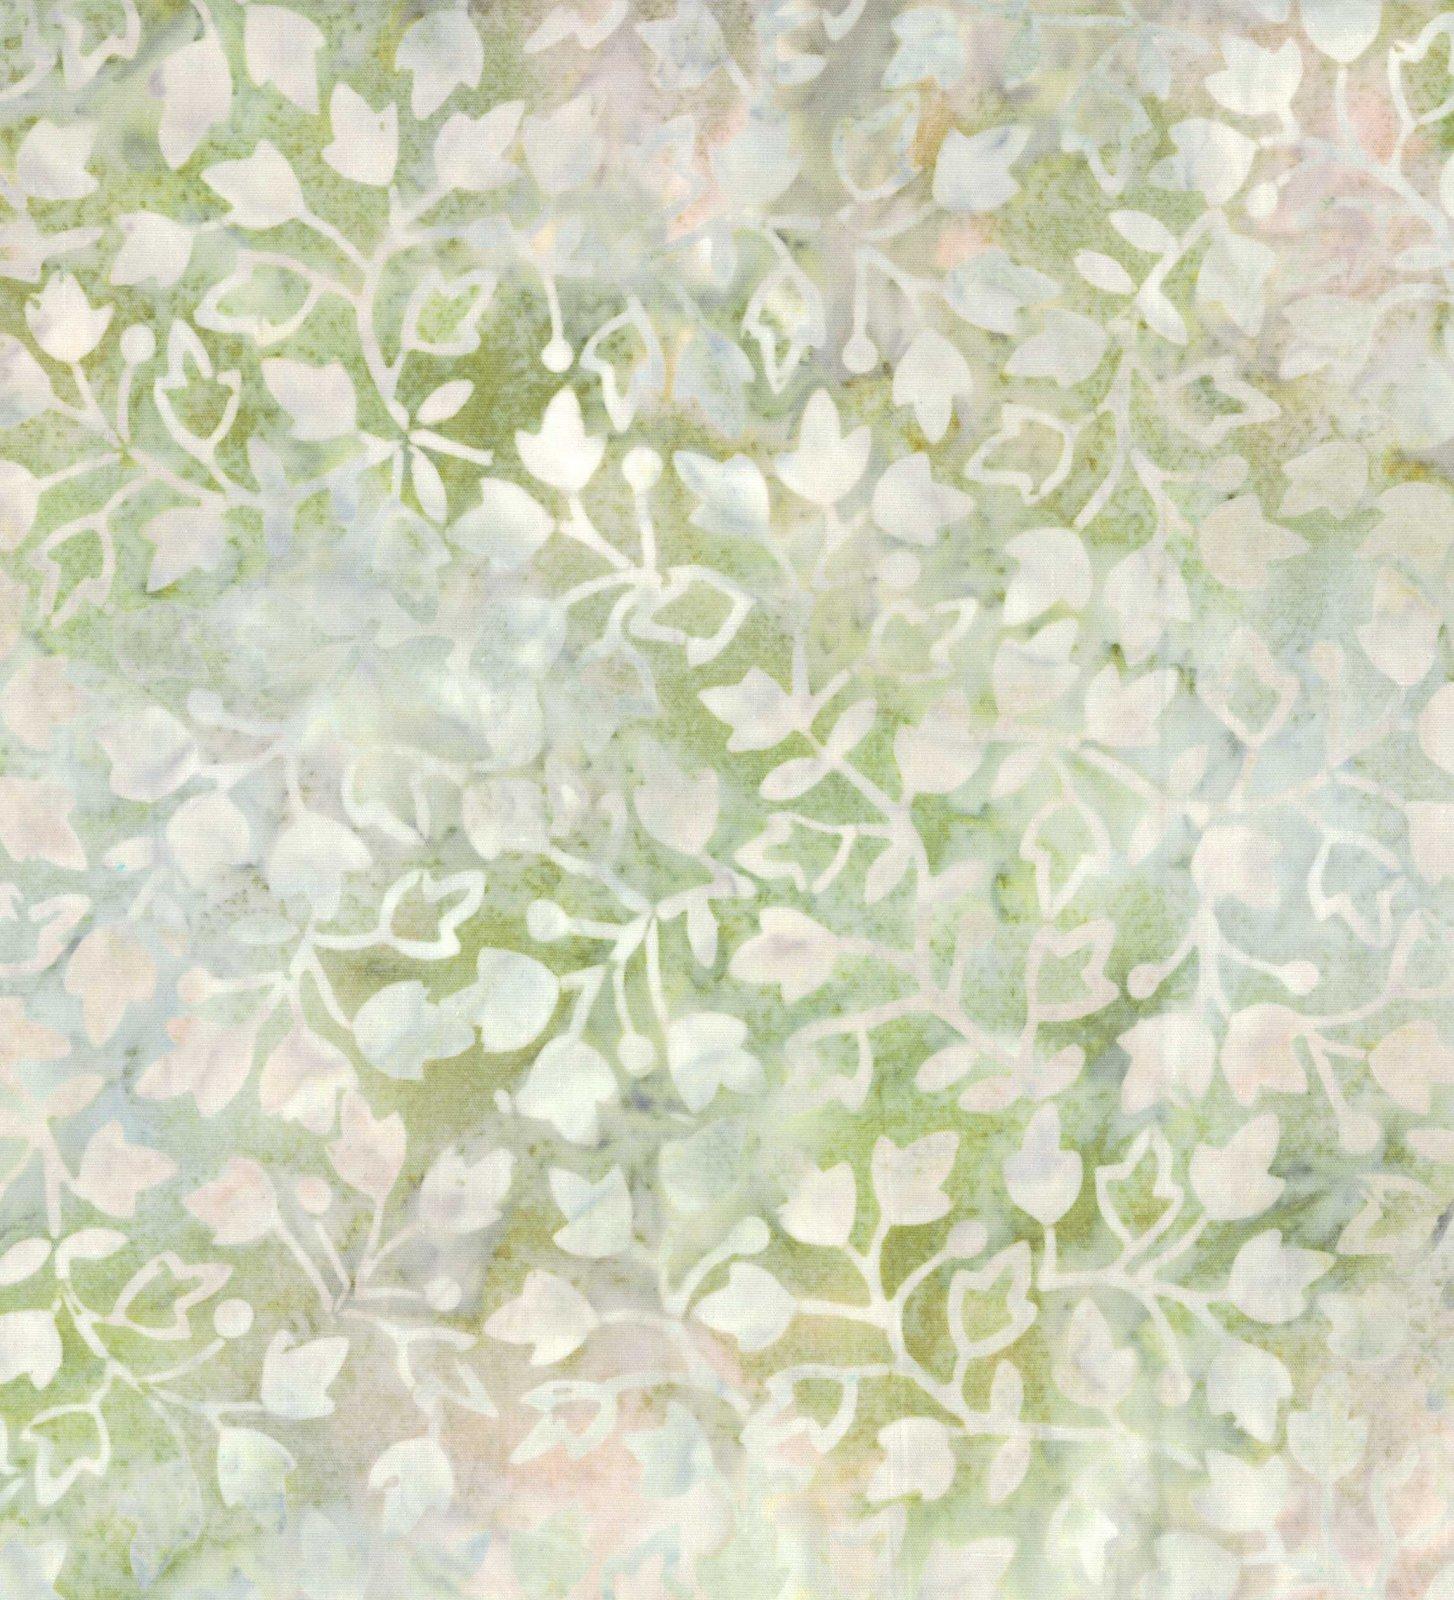 22132-907 Batavian Batiks by Wilmington Prints Ivy Vines Lt Gray/Green  *50% Savings* (ONE YARD MINIMUM CUT)